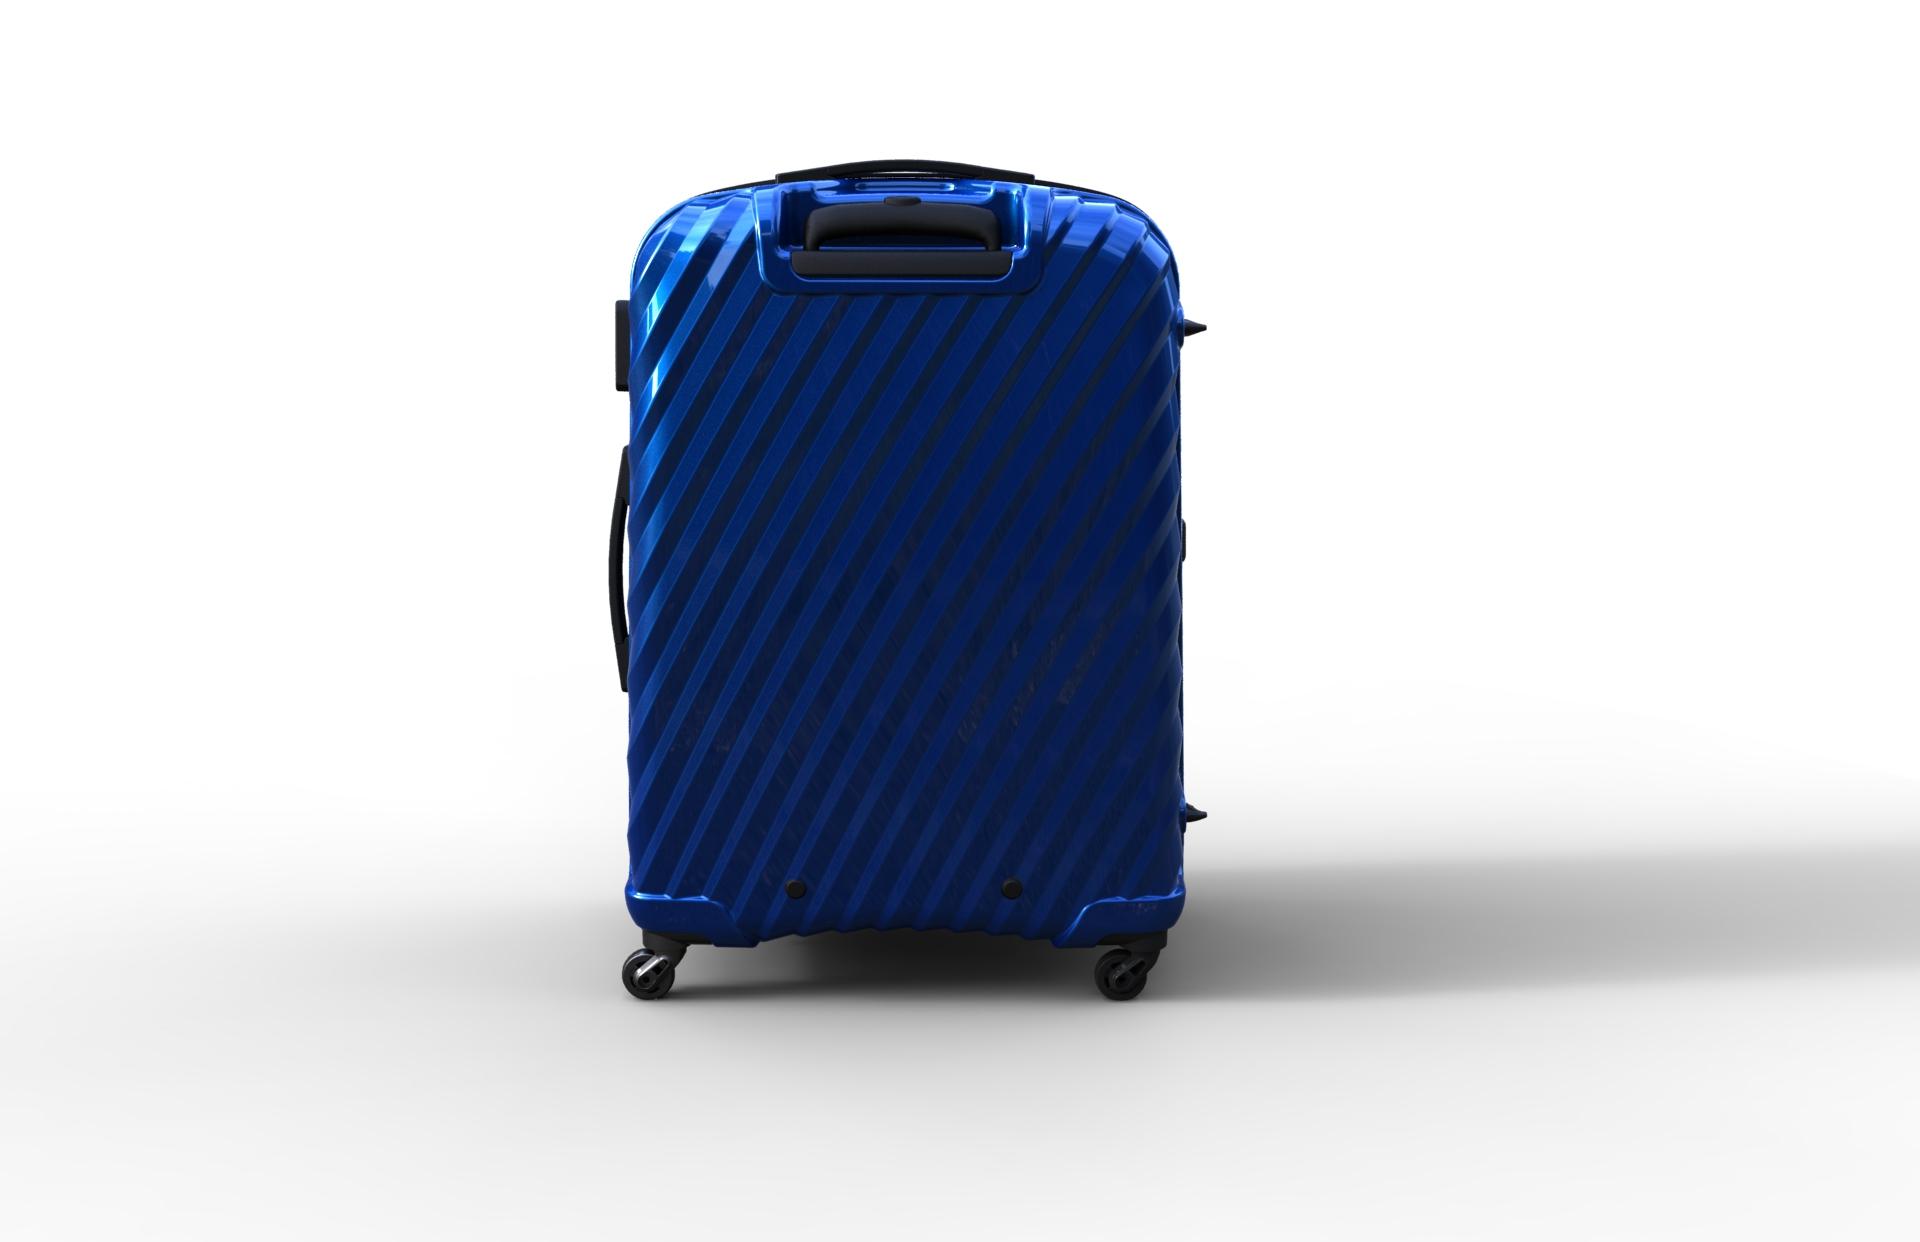 trolley suitcase bag 03 3d model max fbx ma mb obj 286007